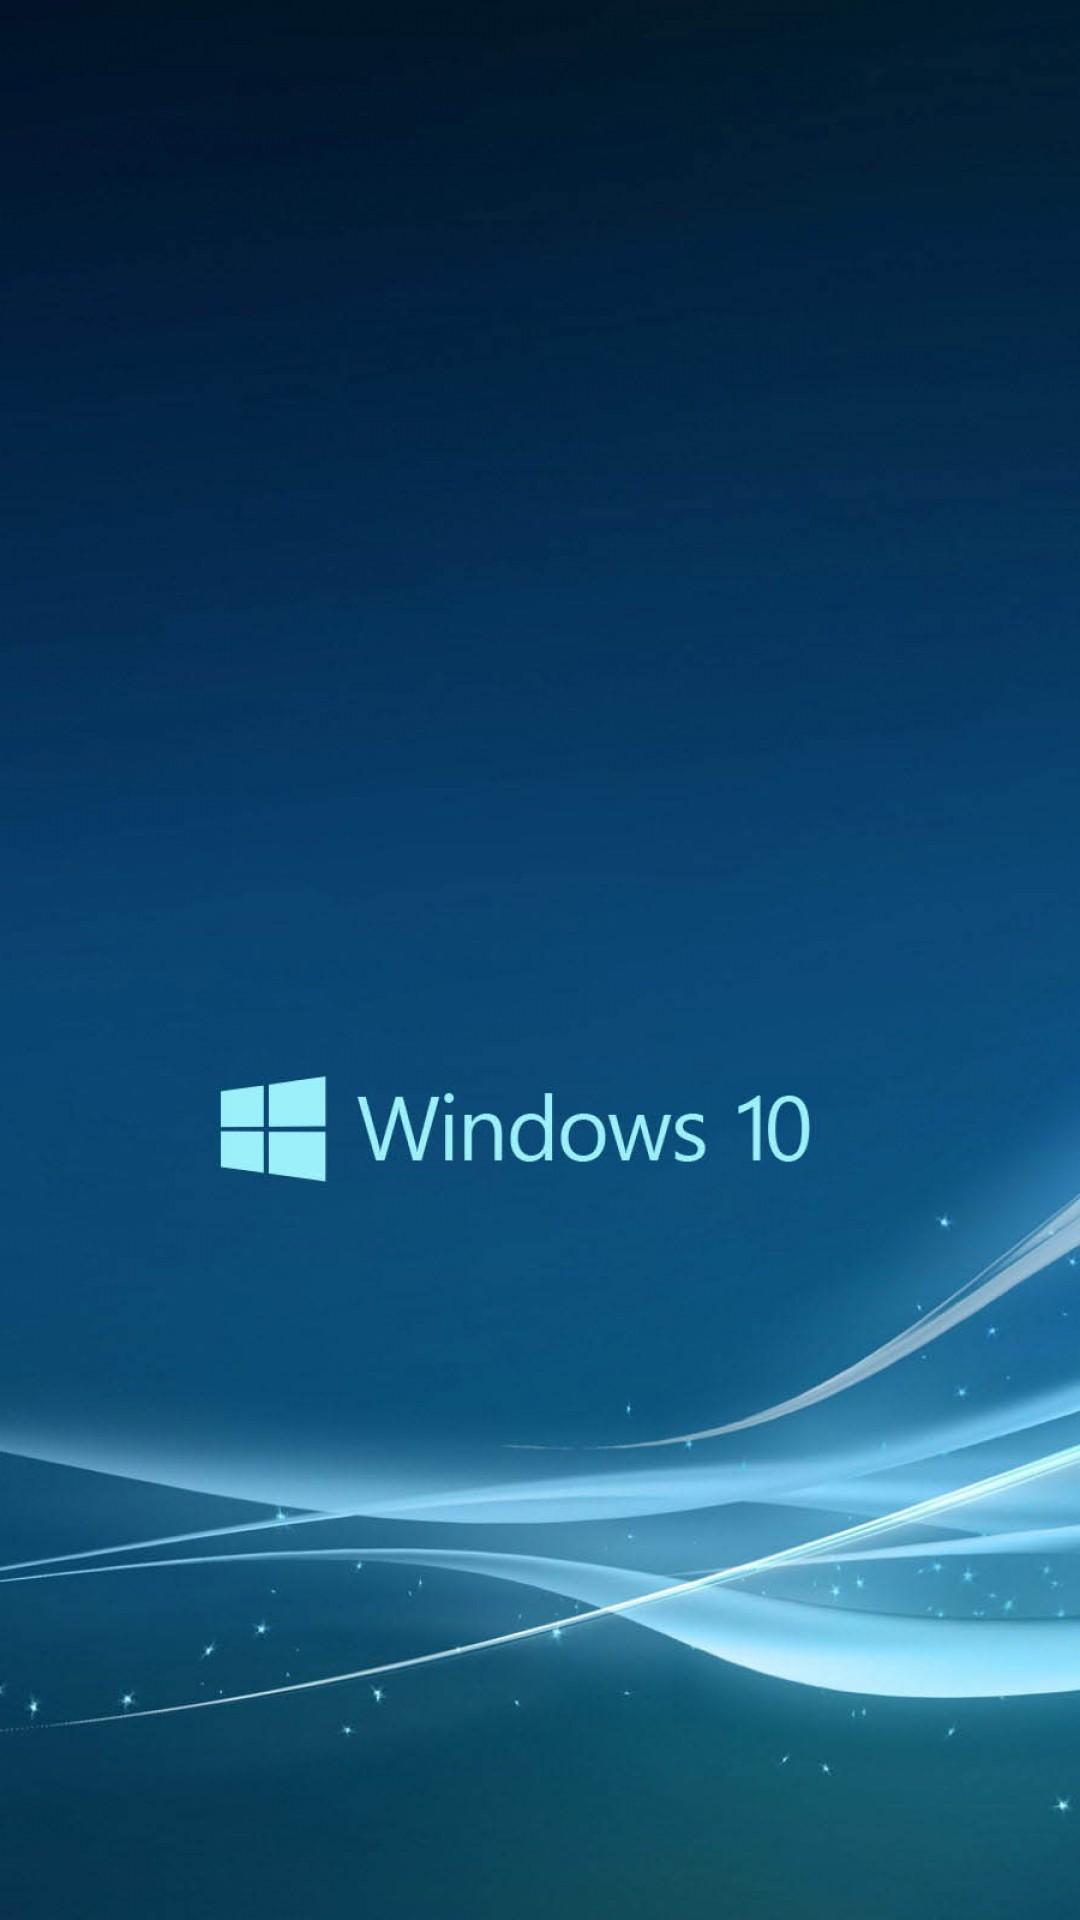 45 How To Save Wallpaper On Windows 10 On Wallpapersafari